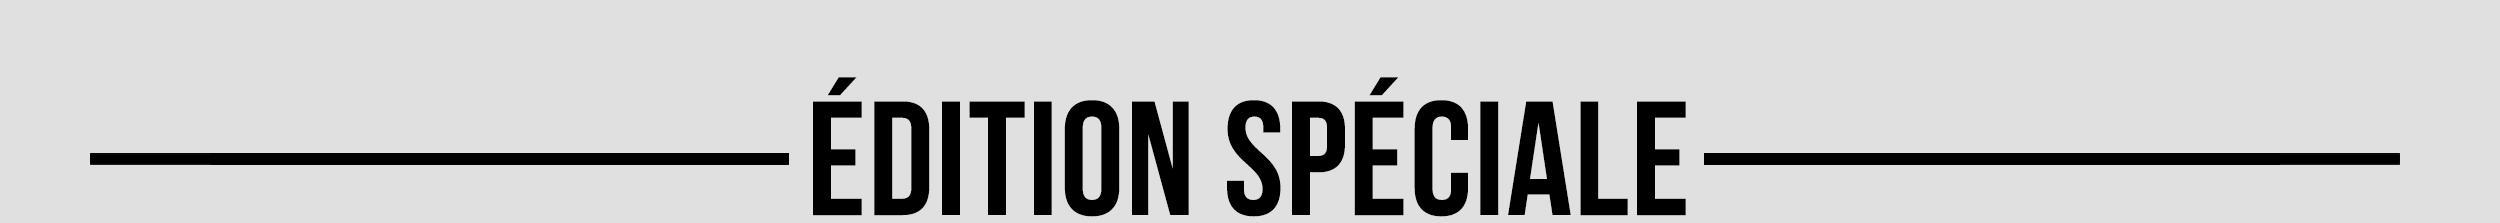 tev-special-edition-fr